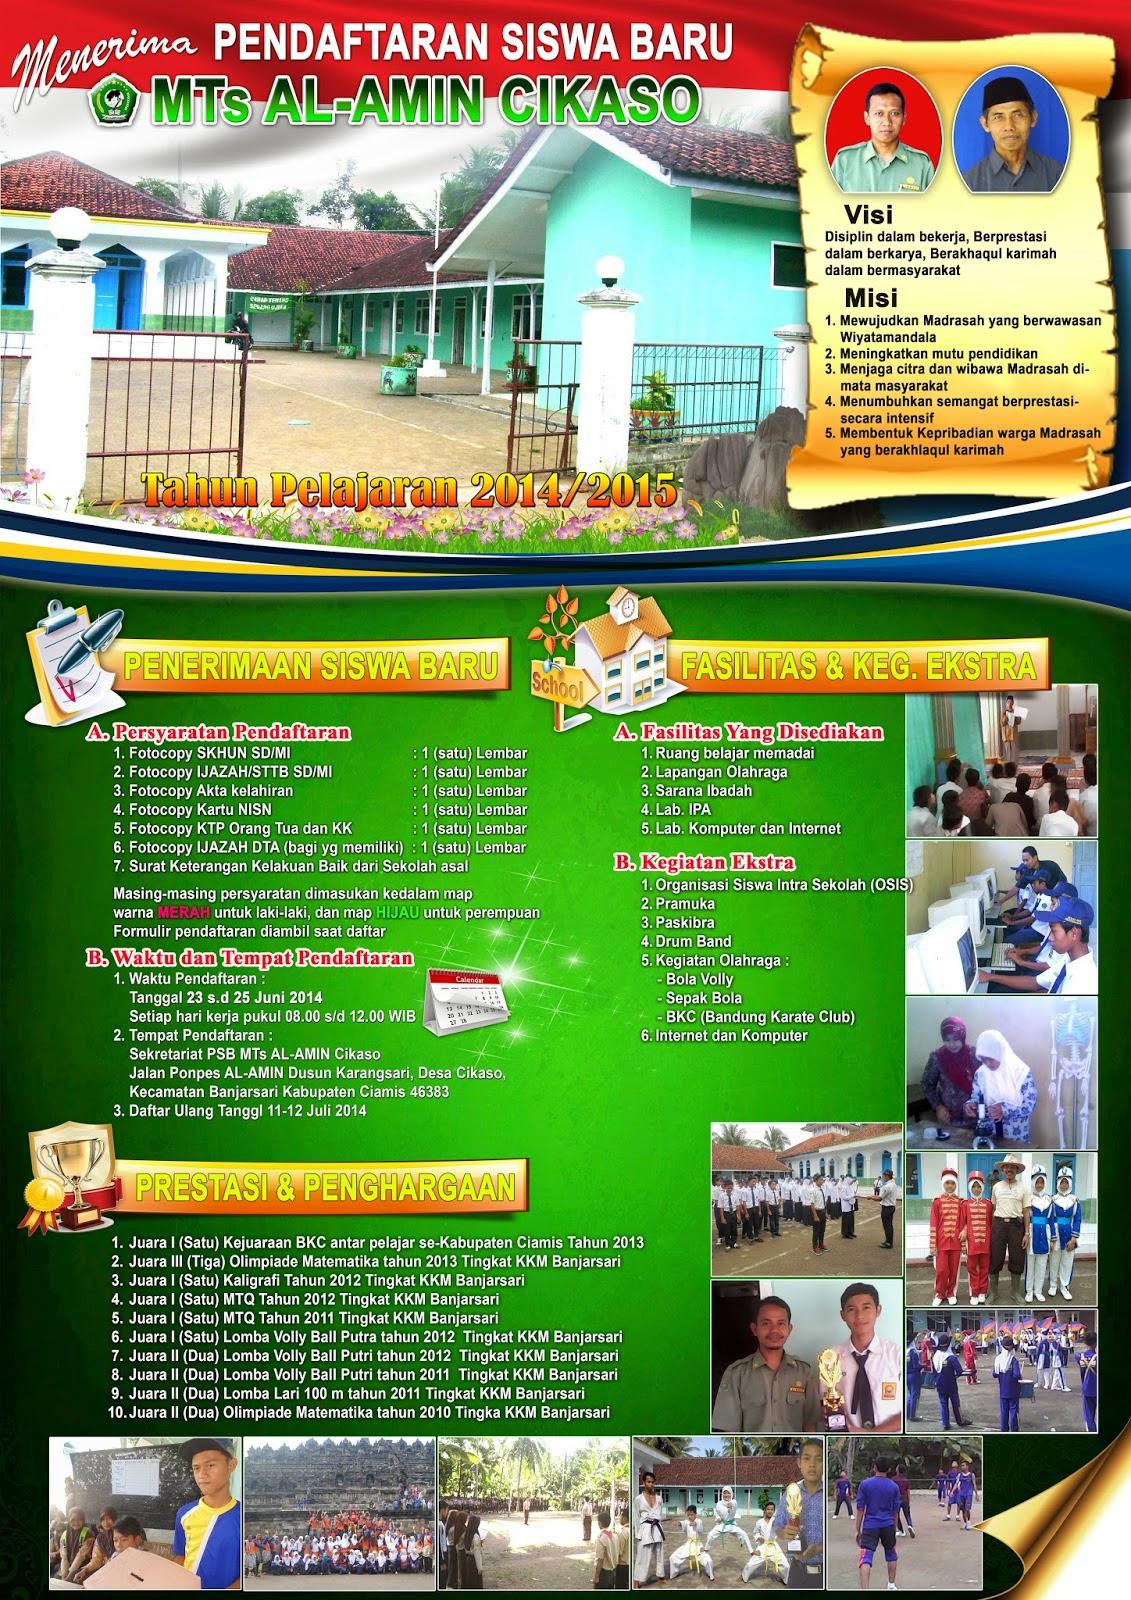 Iskandarniza Contoh Brosur Psb Mts Al Amin Cikaso Tapel 2014 2015